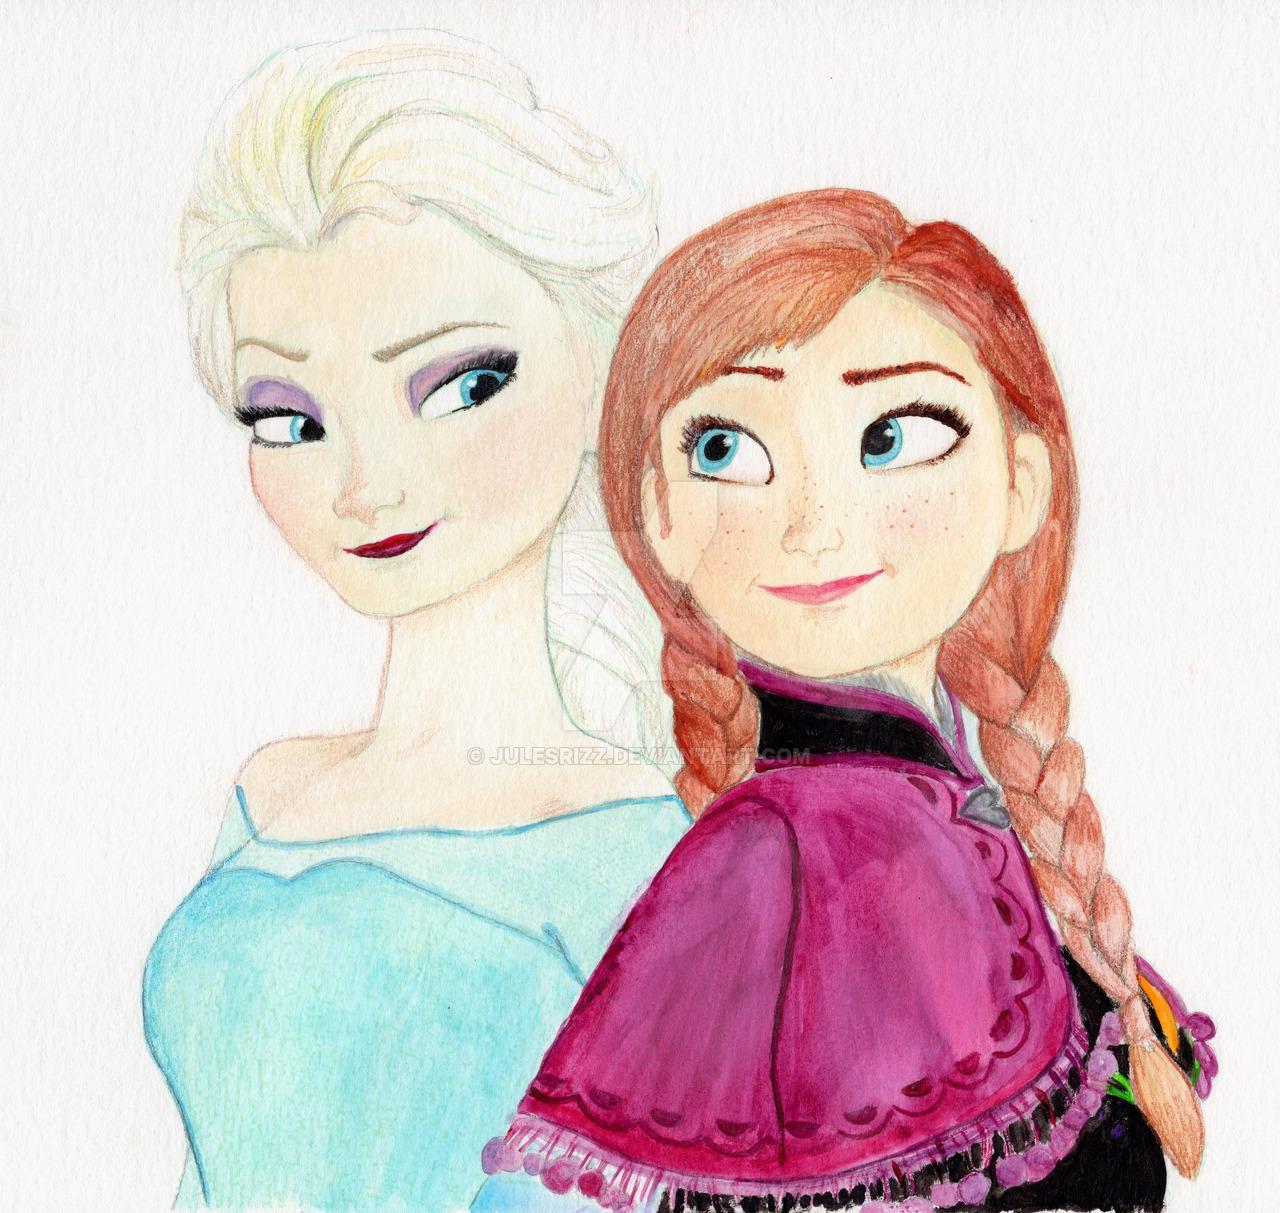 1280x1213 Elsa And Anna Disney's Frozen By Julesrizz